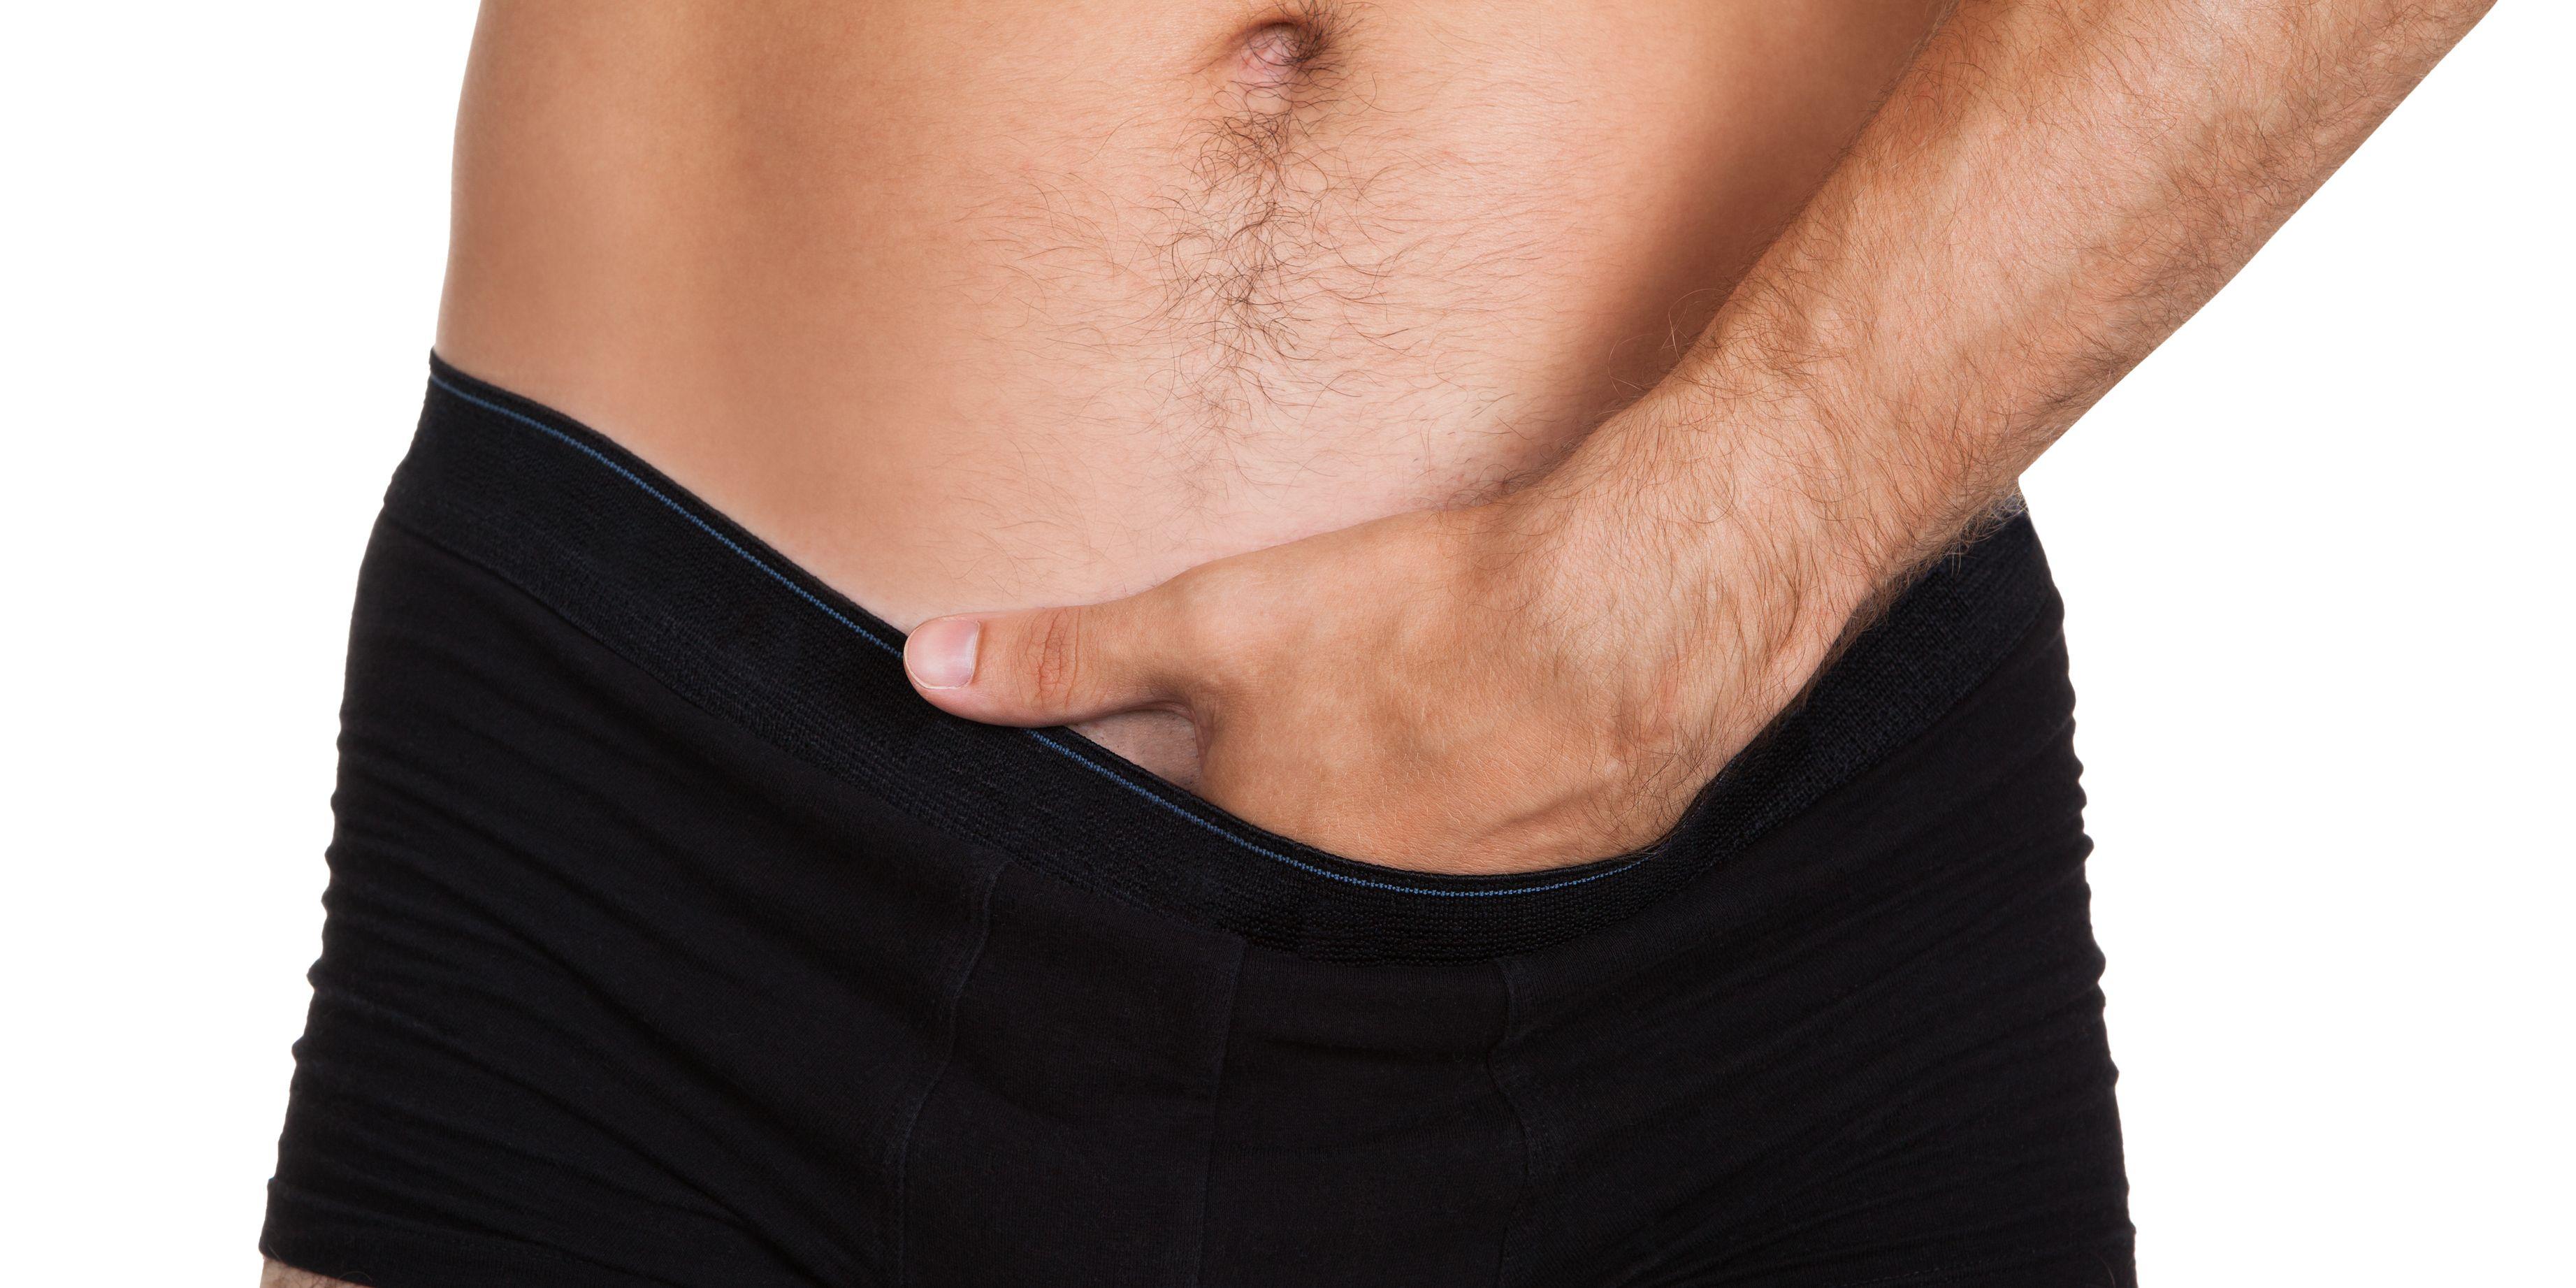 6 Causes of Penis Irritation